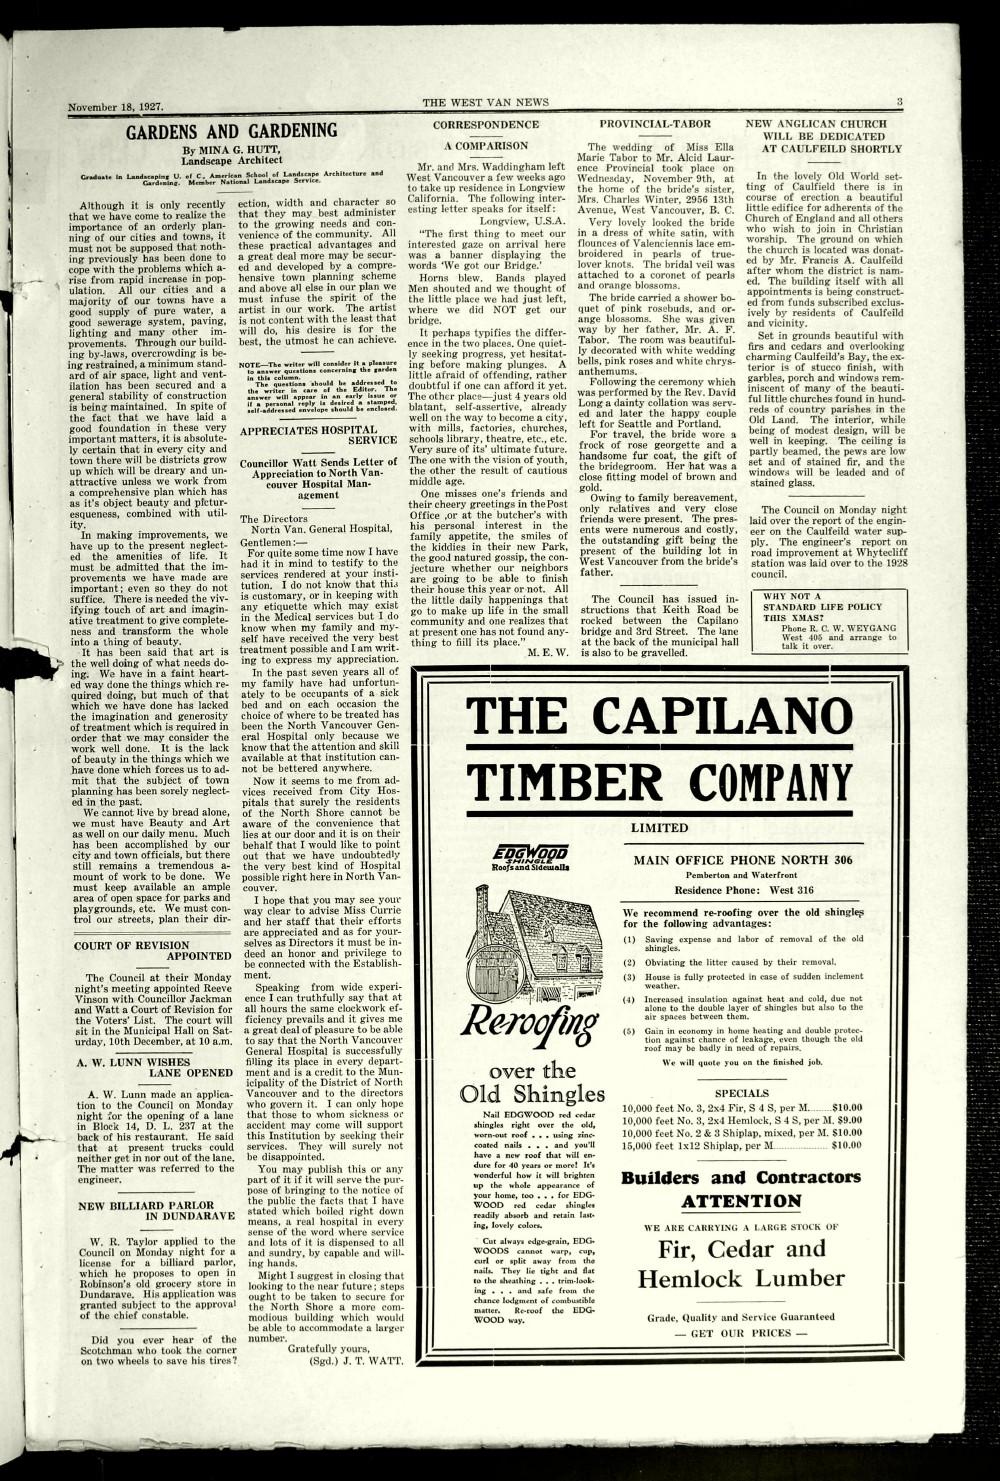 West Van. News (West Vancouver), 18 Nov 1927